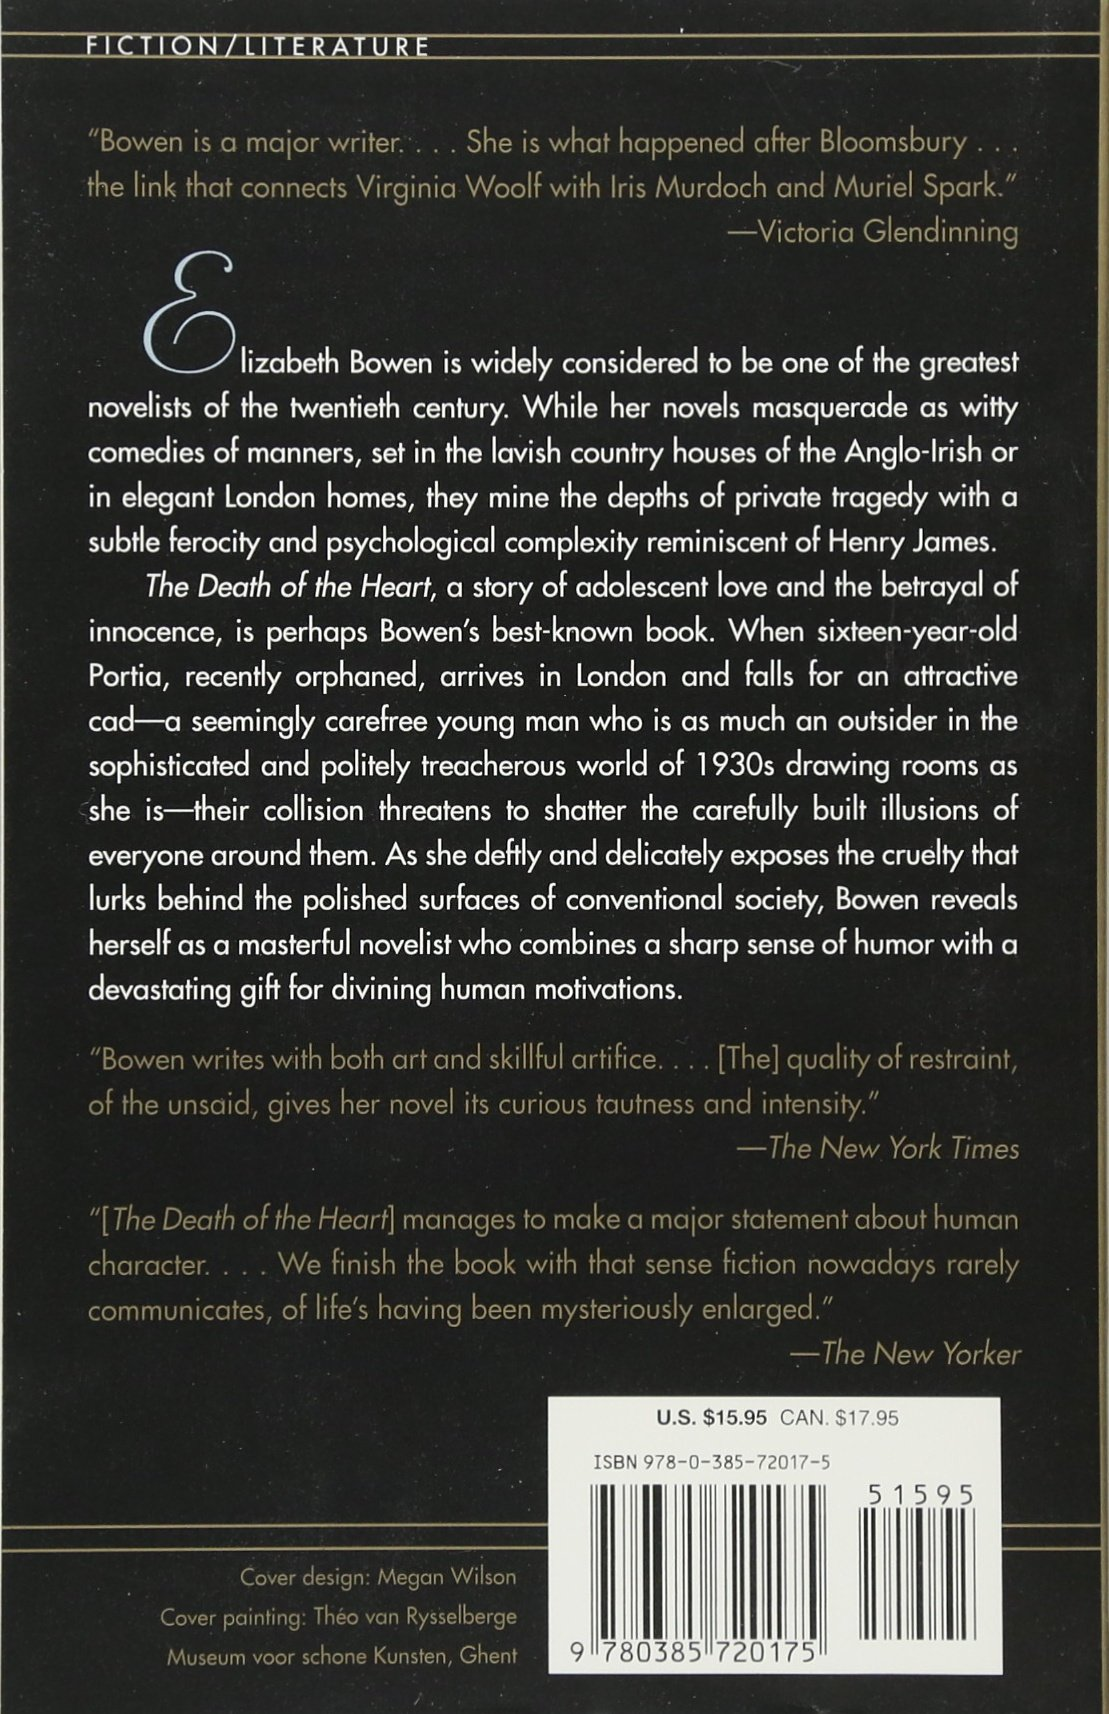 Amazon: The Death Of The Heart (9780385720175): Elizabeth Bowen: Books